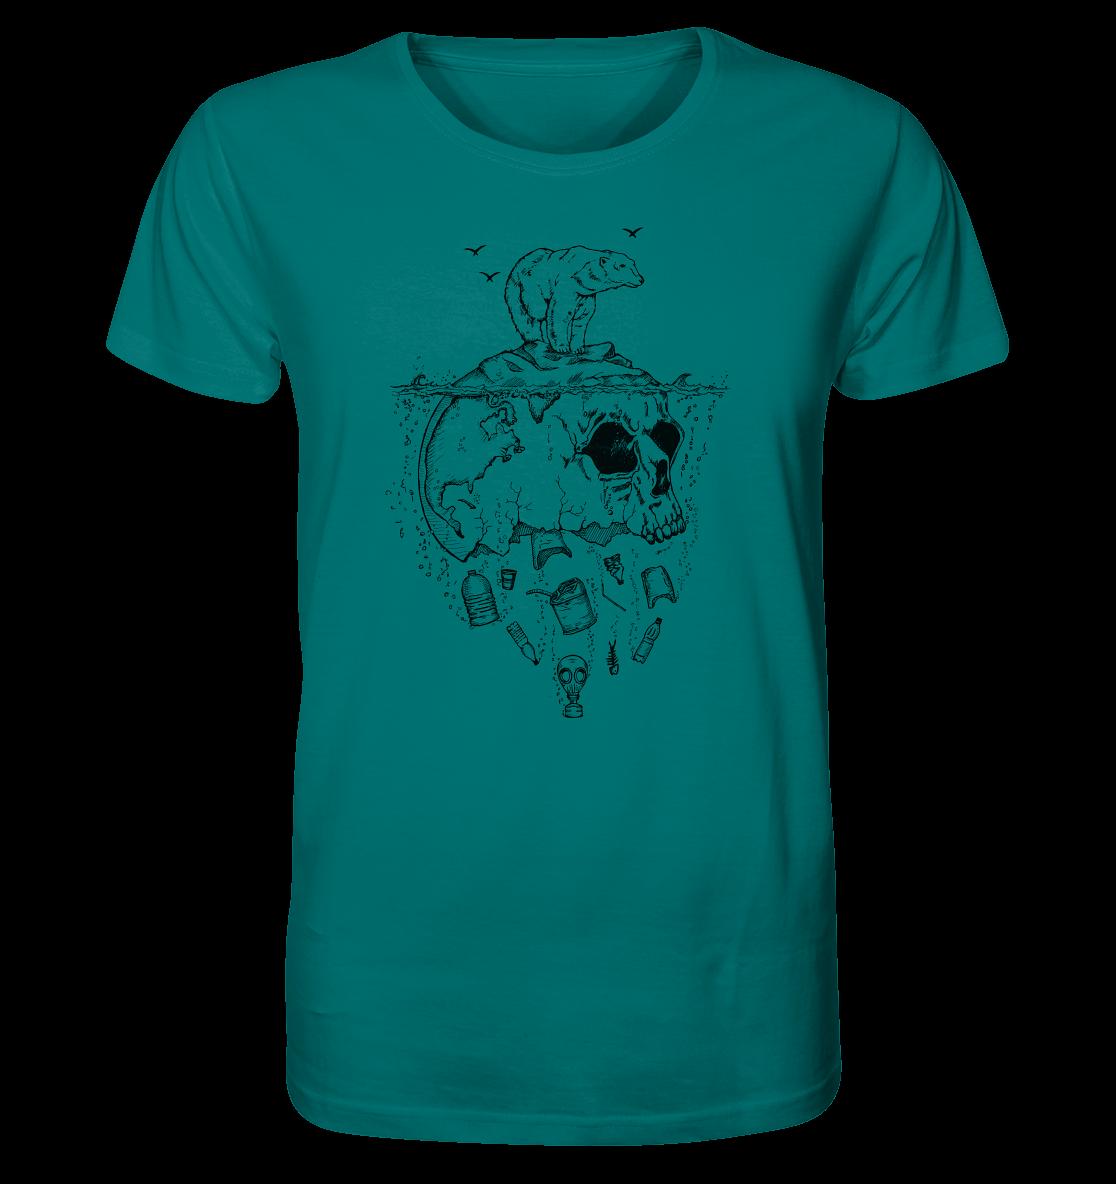 front-organic-shirt-007373-1116x-6.png